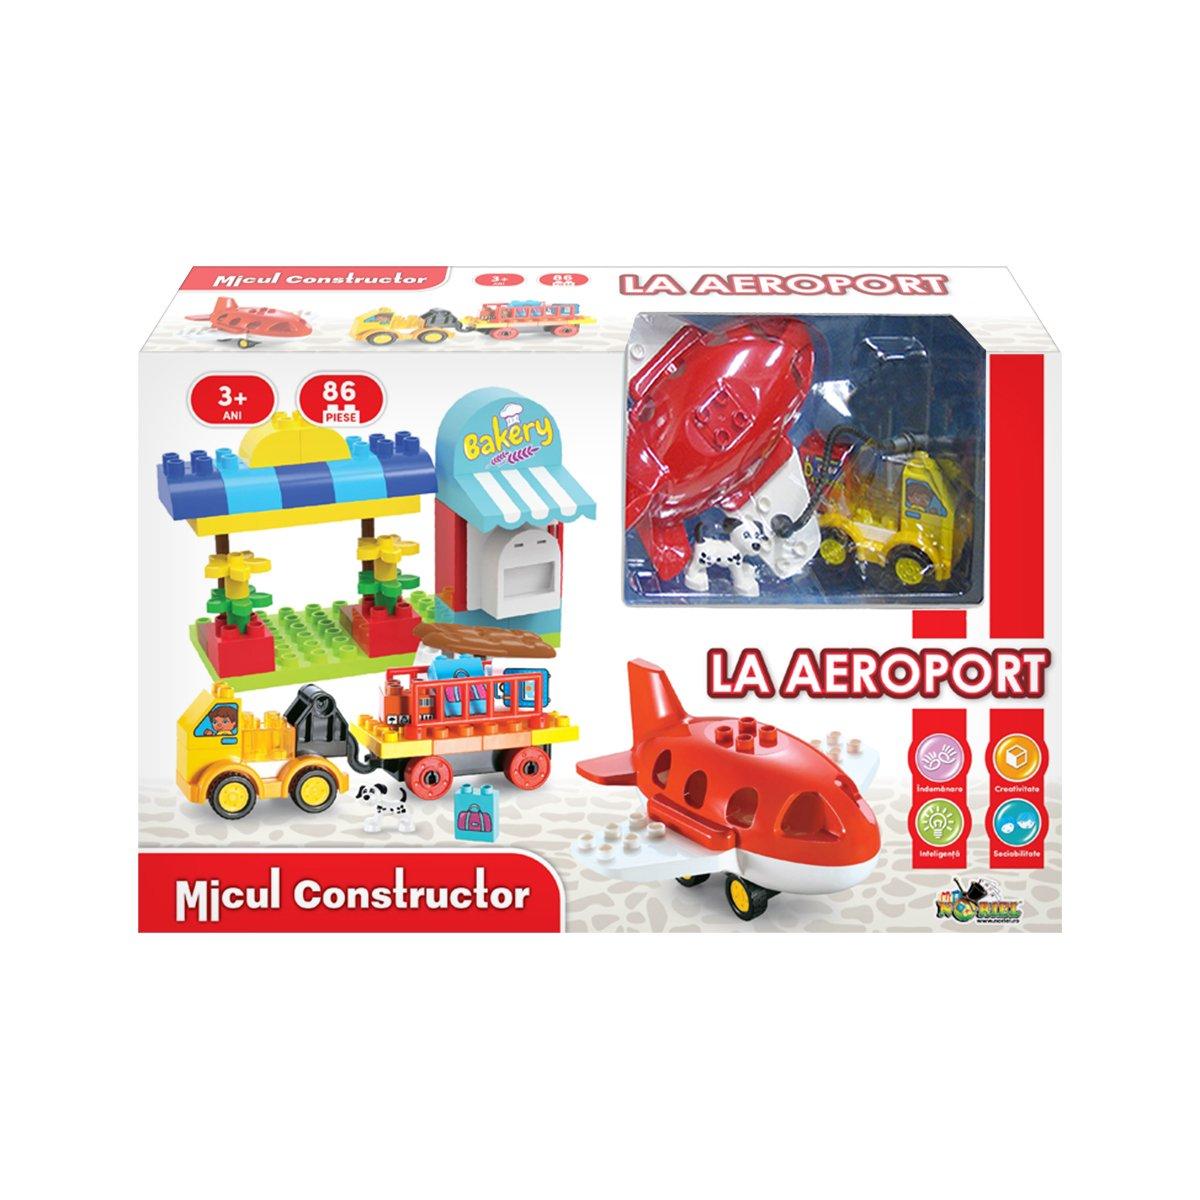 Jucarie de constructie La Aeroport, Micul Constructor